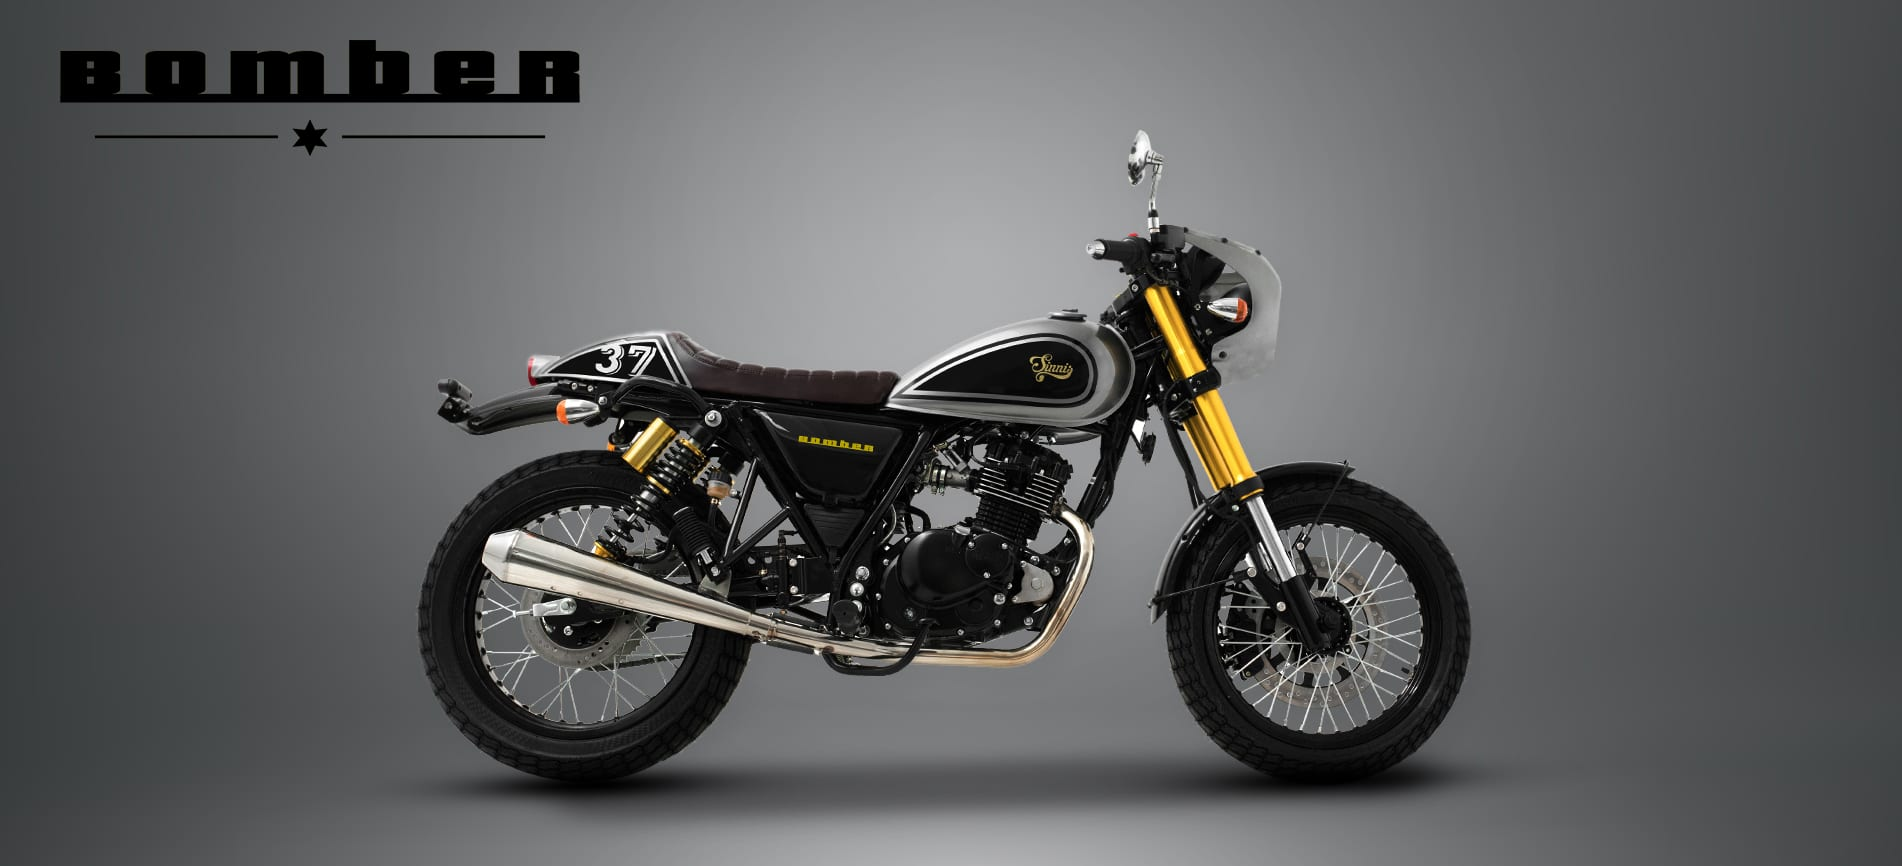 Sinnis Bomber 125cc Motorcycles Motorbike